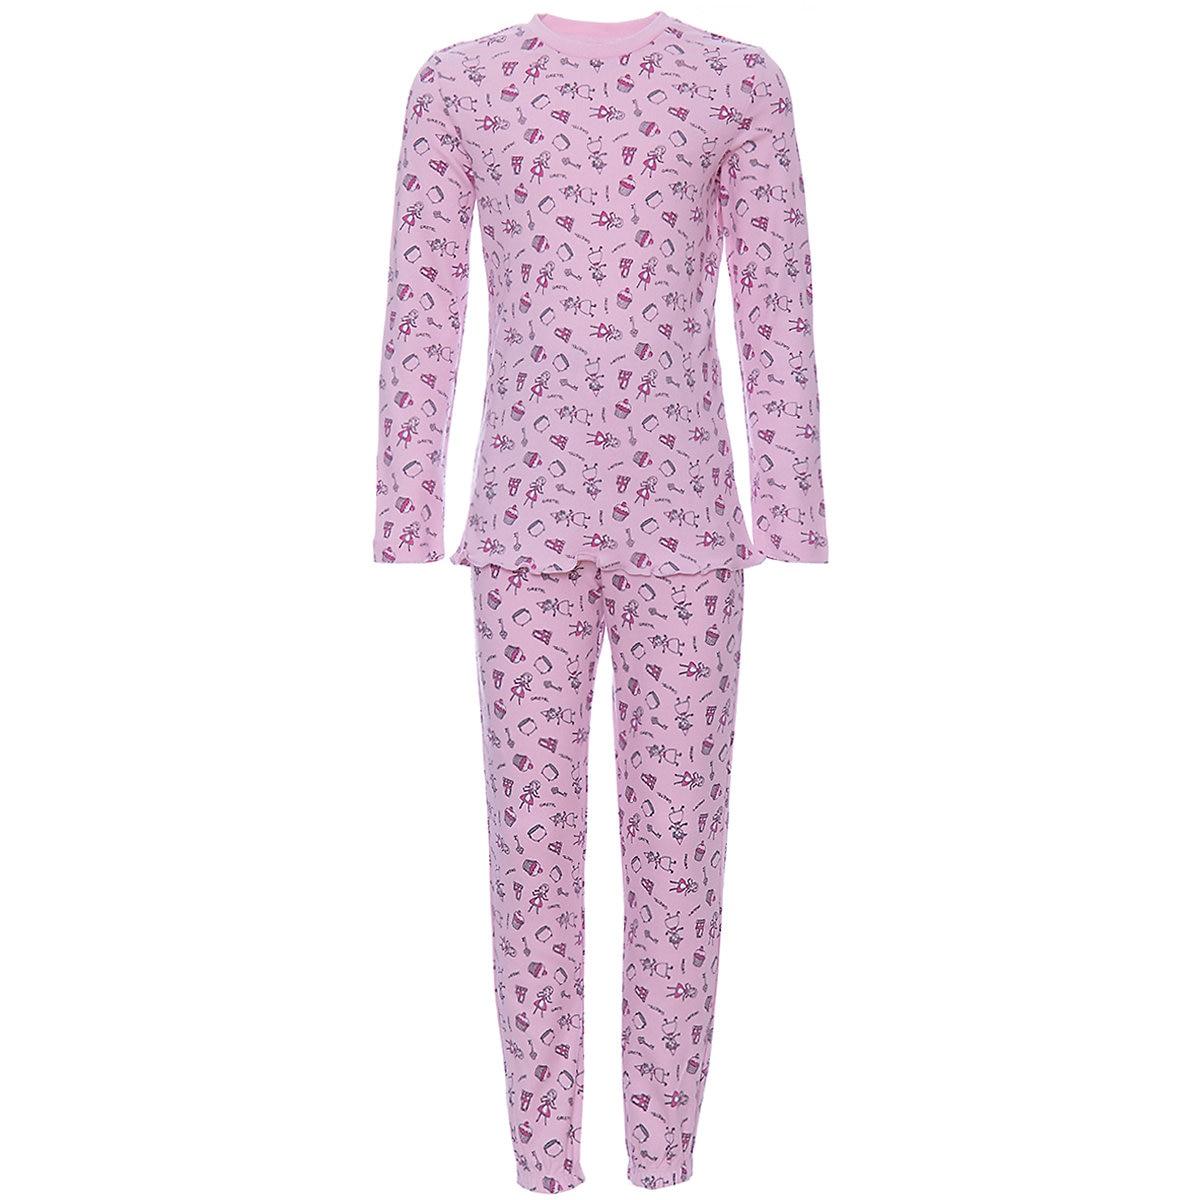 ORIGINAL MARINES Pajama Sets 9501969 Cotton Girls childrens clothing Sleepwear Robe leaf print ruffle hem cami pajama set